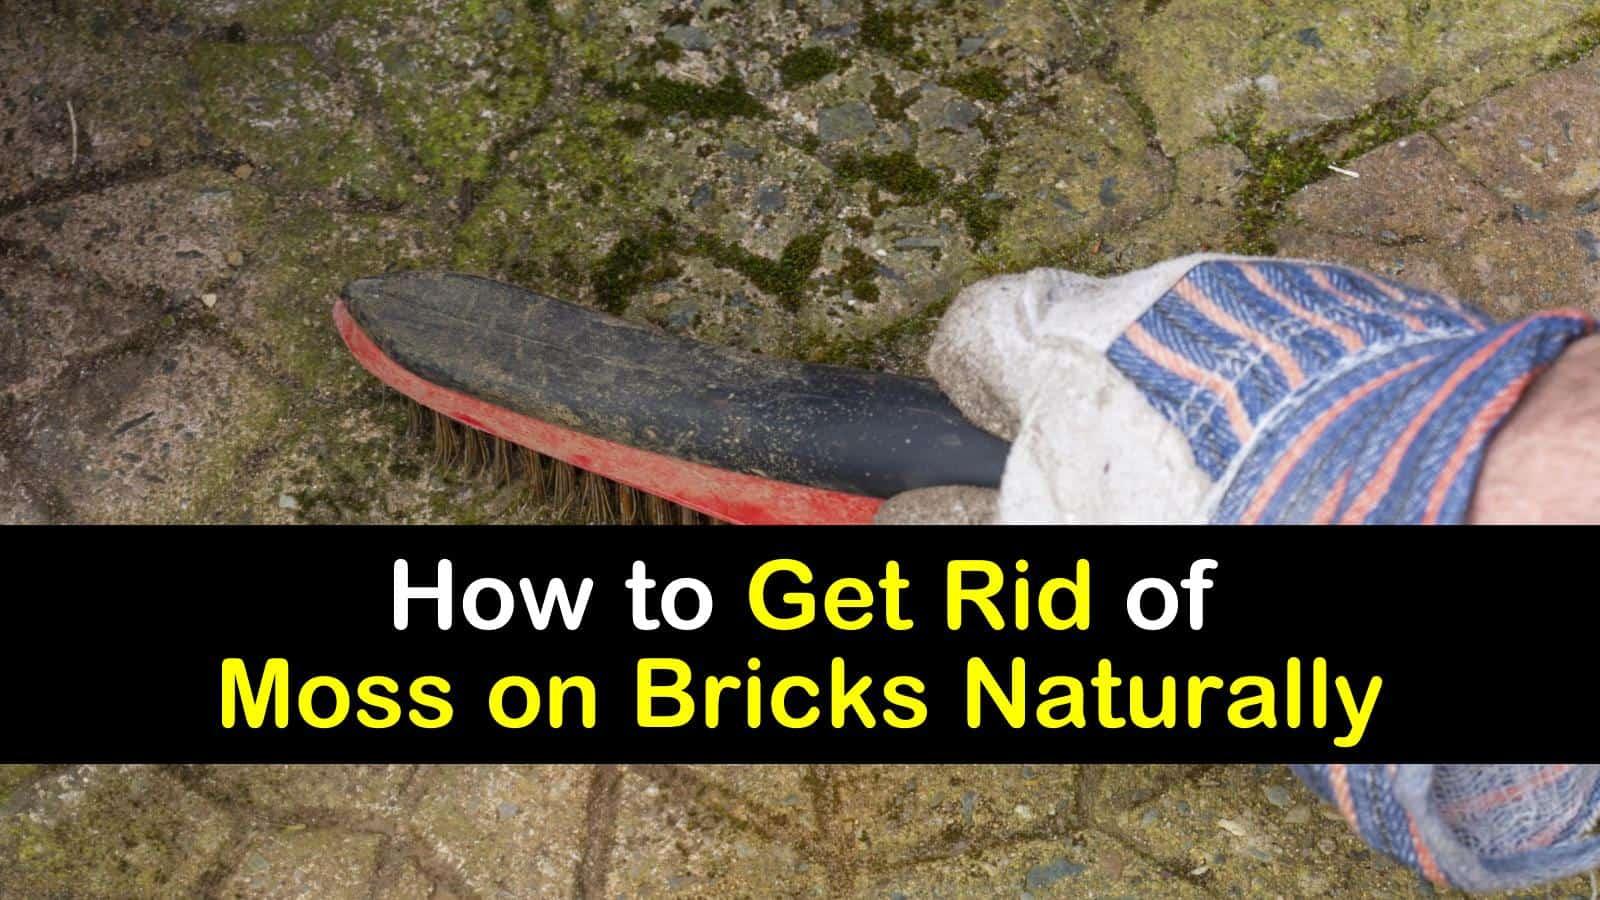 get rid of moss on bricks naturally